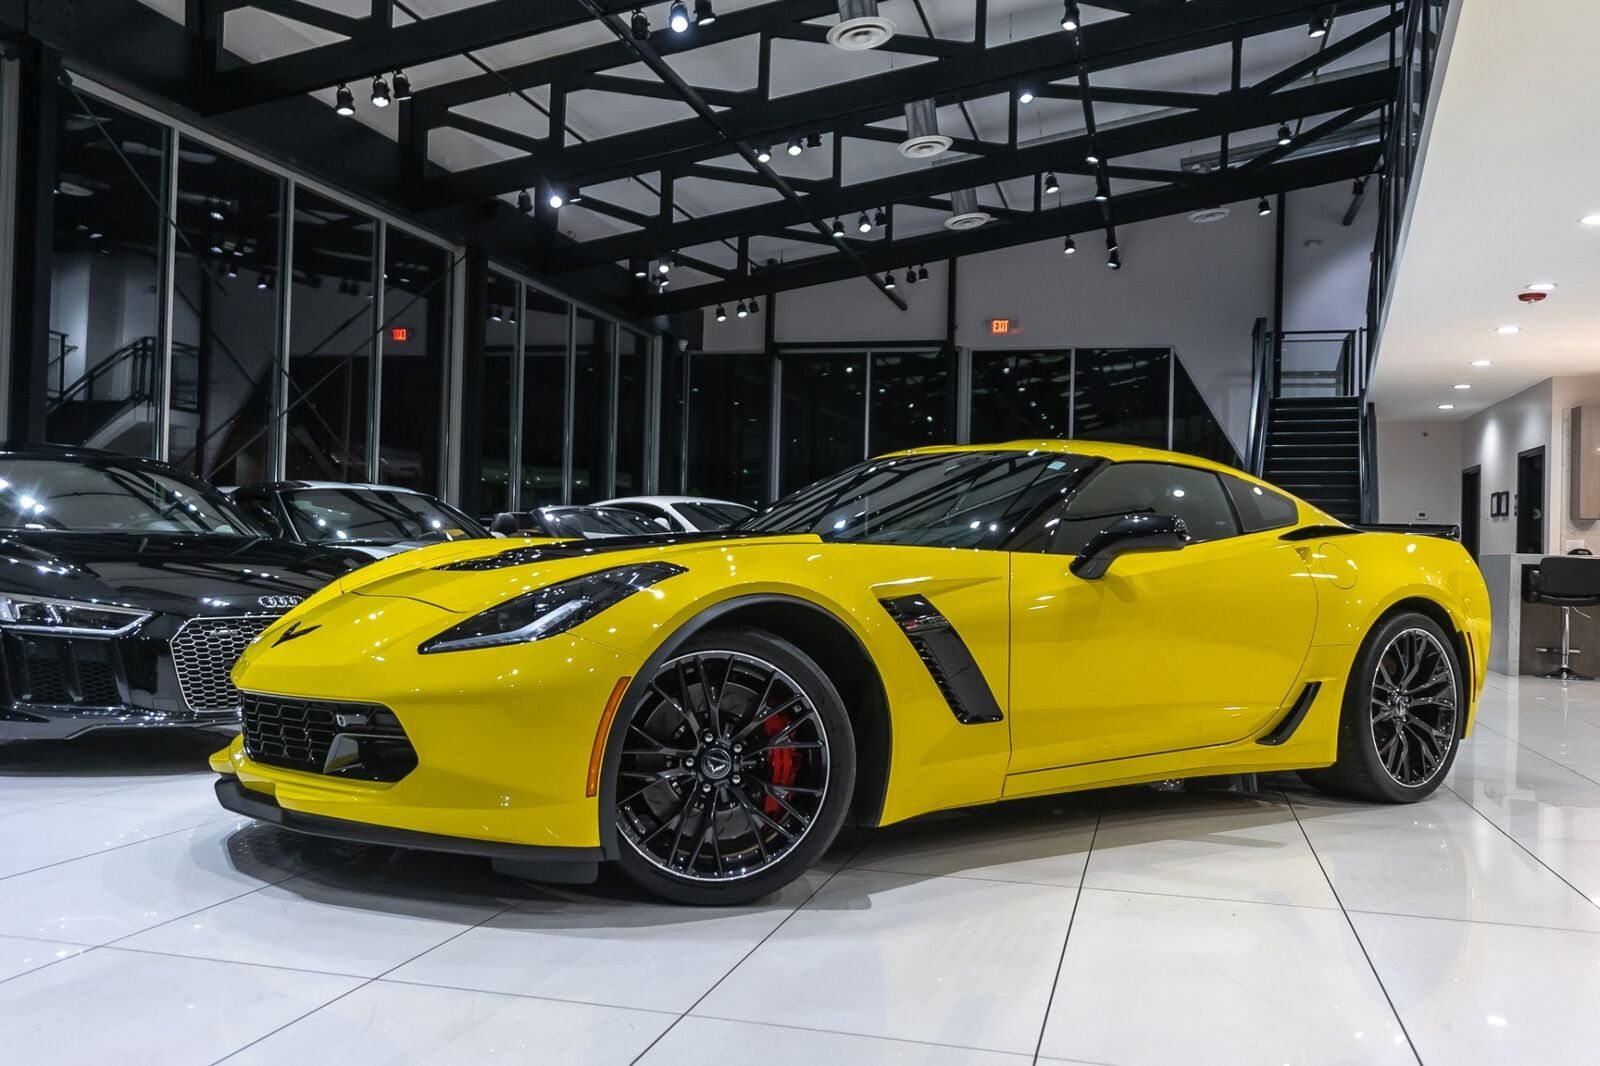 2016 Yellow Chevrolet Corvette Coupe 2LZ   C7 Corvette Photo 2